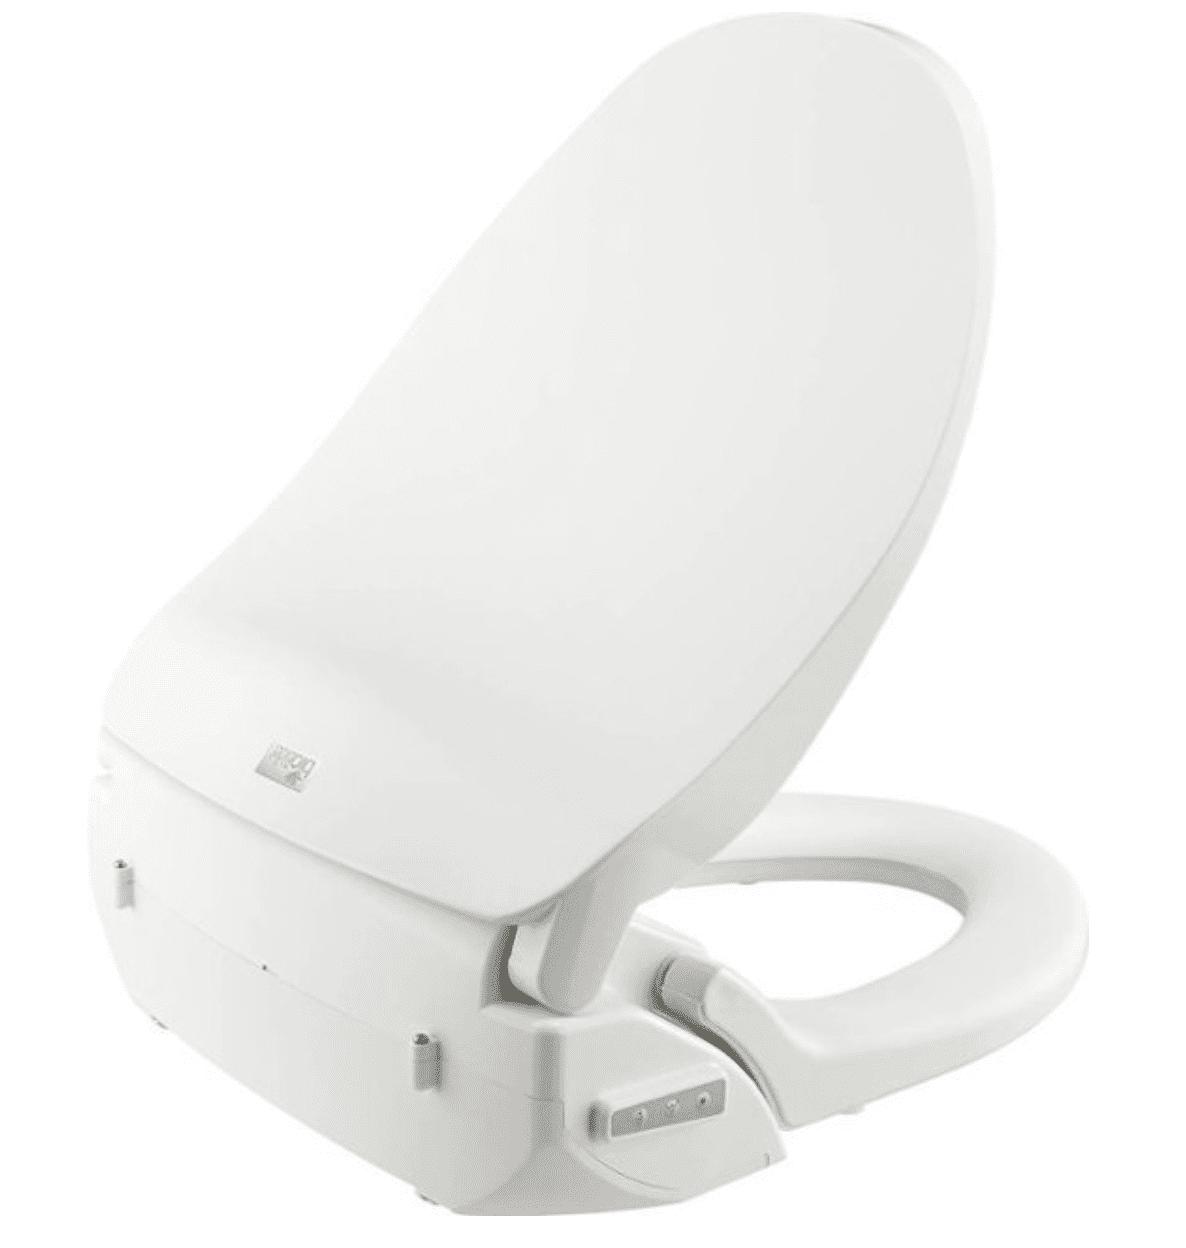 Best Buy: Bio Bidet -Electric Bidet Toilet Seat For 9.99